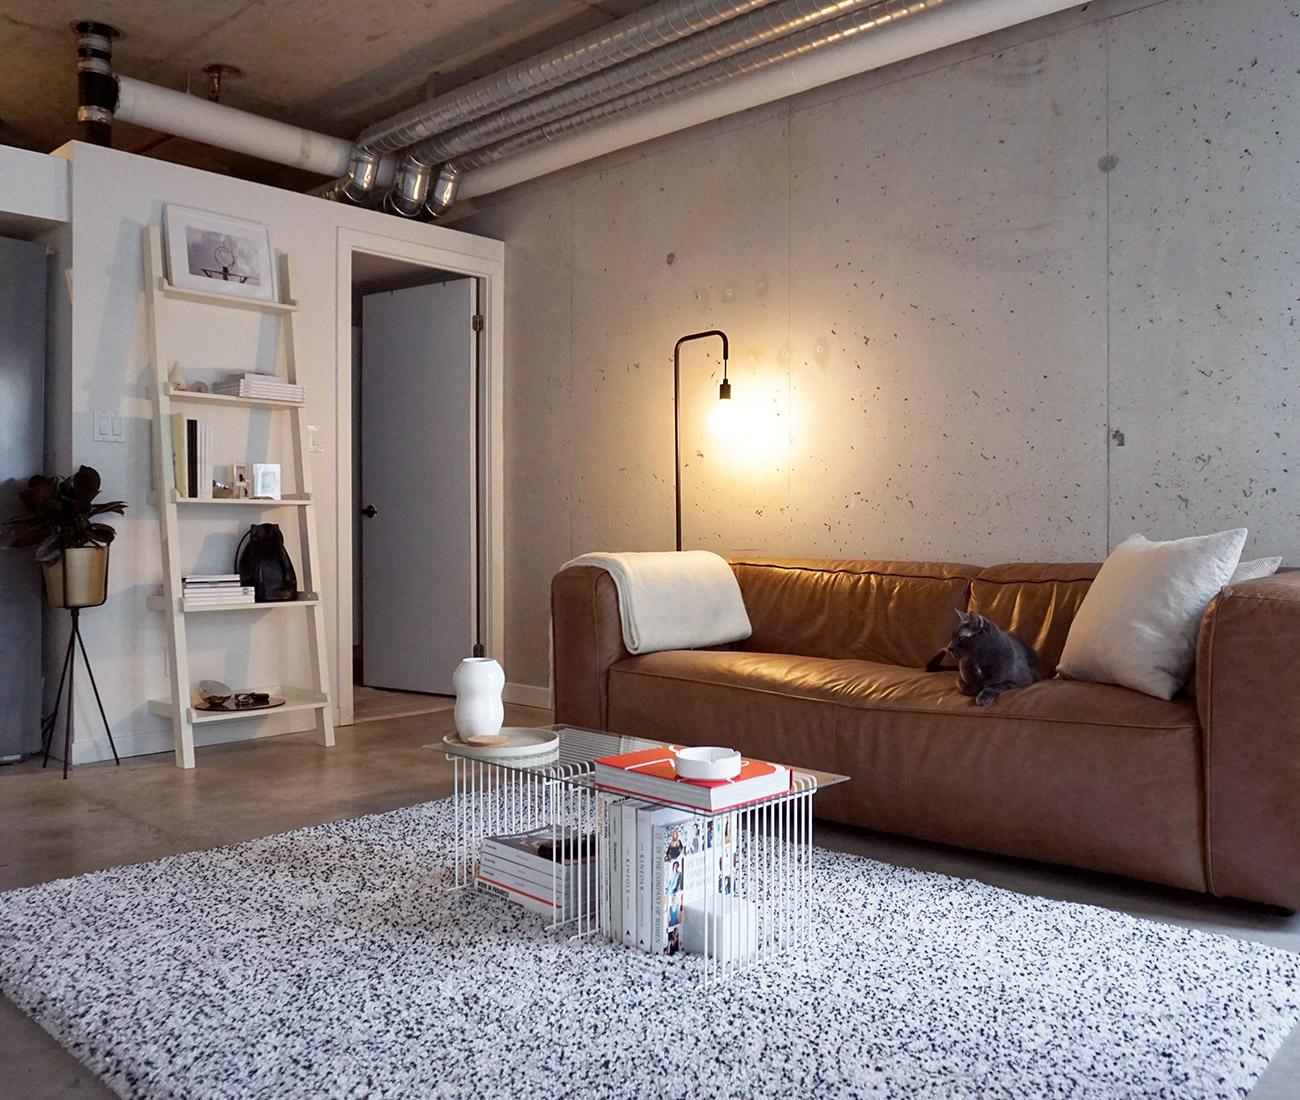 Liberty Village Apartment Brandi Lynne Justin Aguilar Designlines Magazine Small Space Decorating